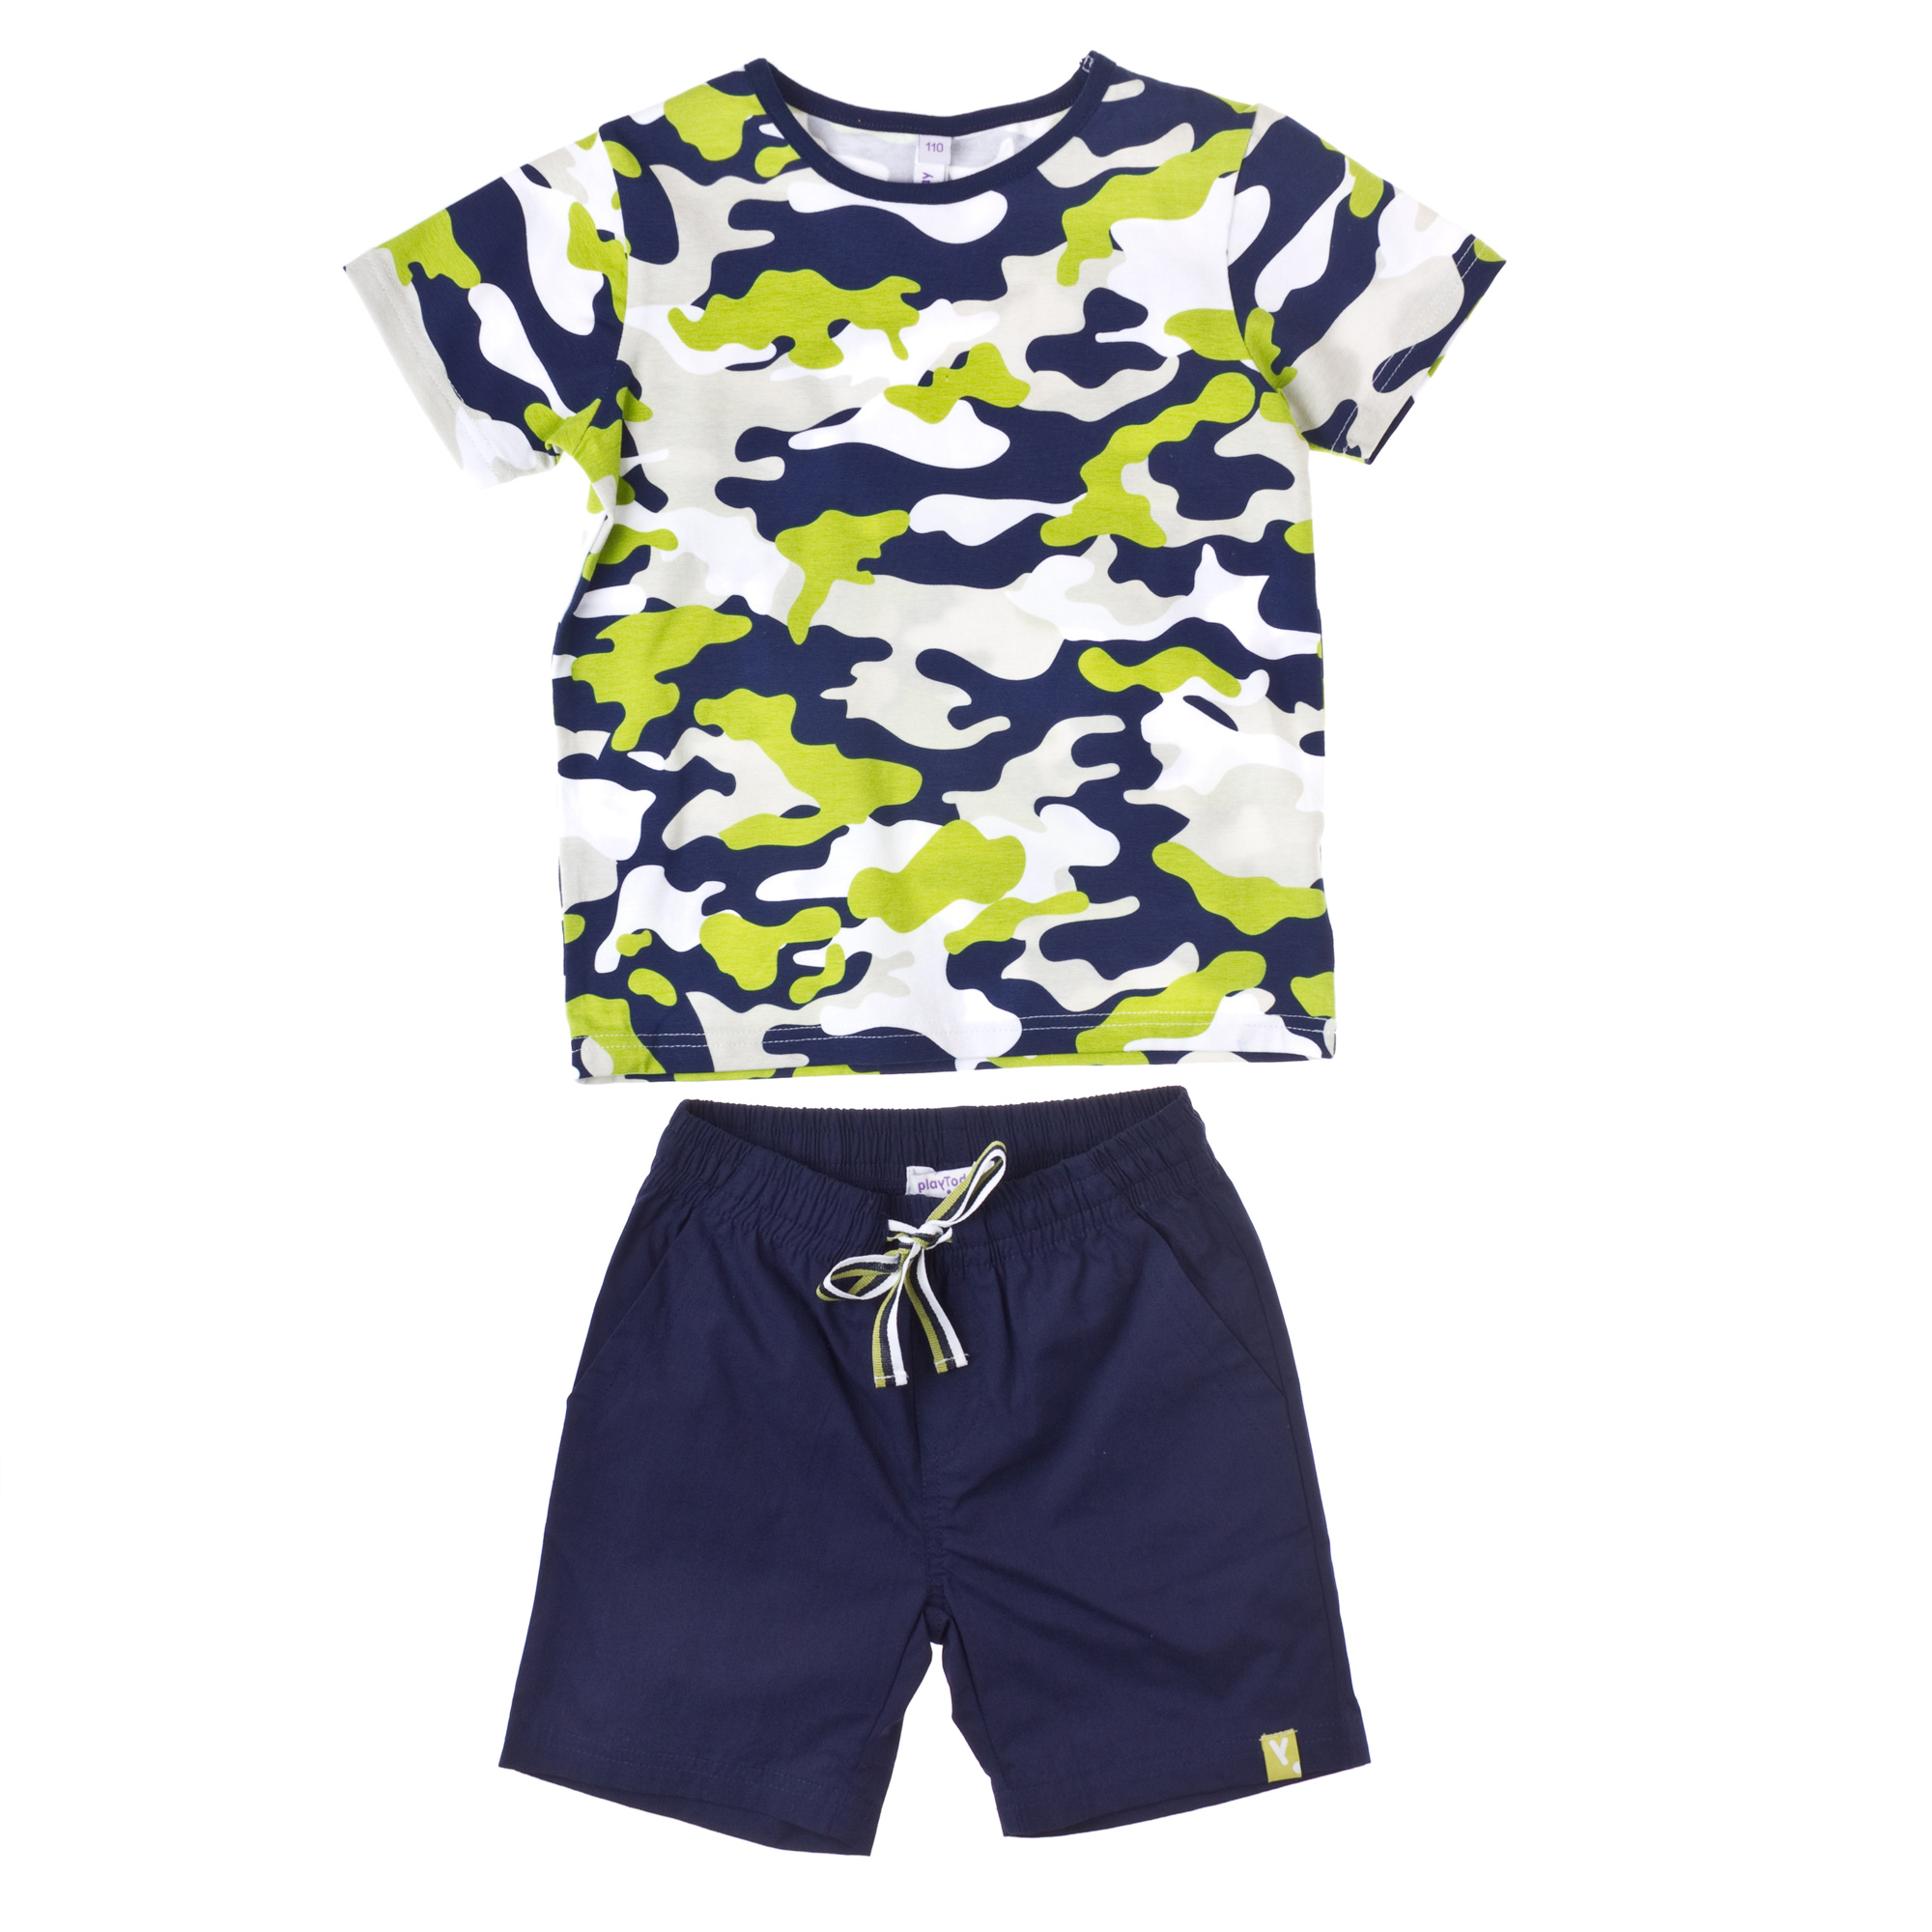 комплект футболка, шорты (текстиль+ ) 351069